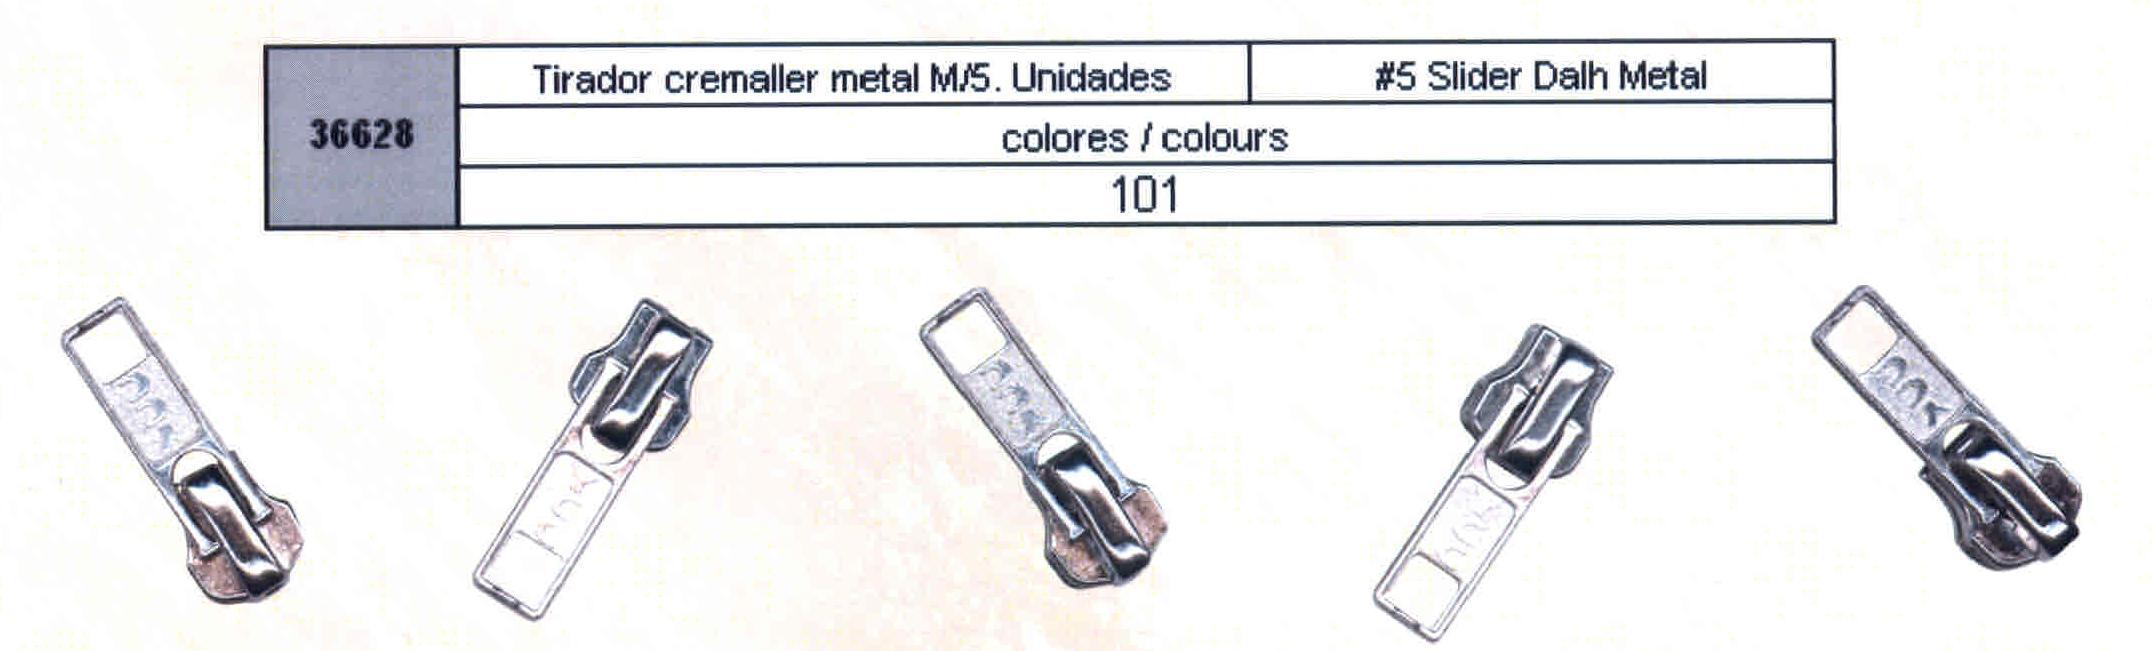 Tirador de Cremallera Metal num. 5 Unidades